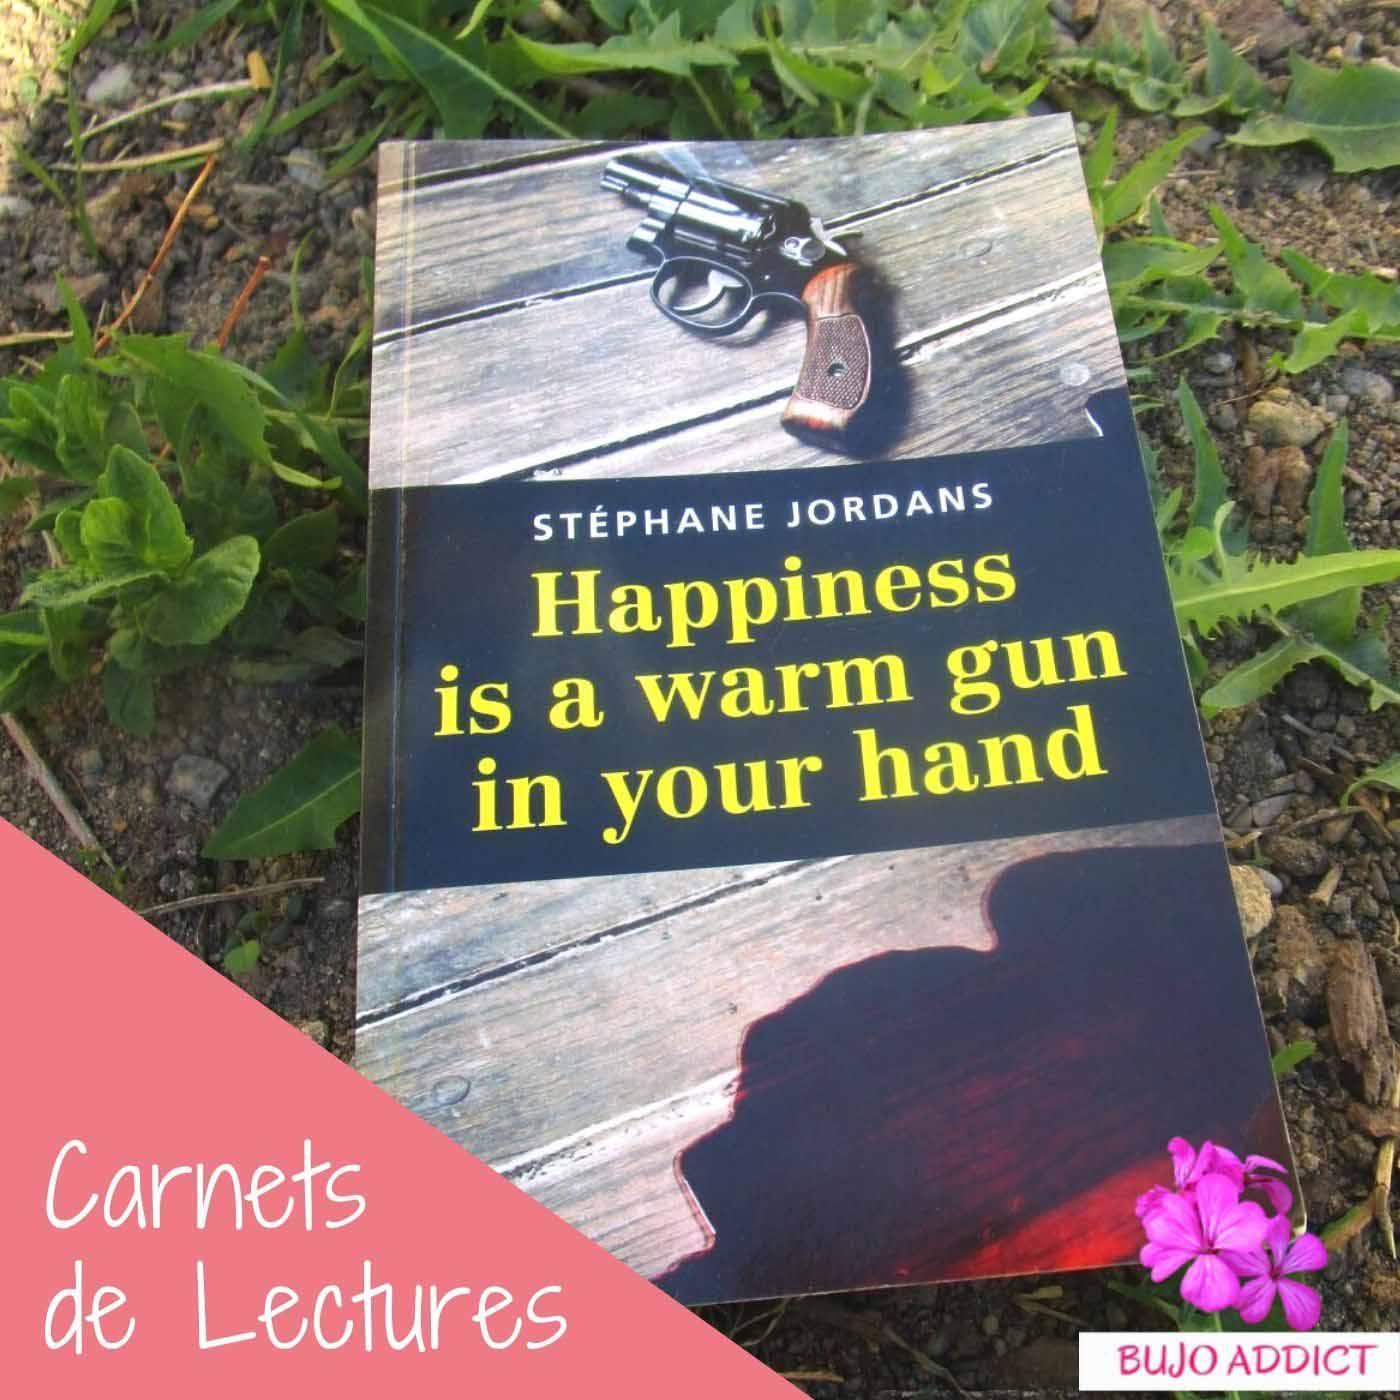 Stéphane Jordans : Happiness is a warm gun in your hand